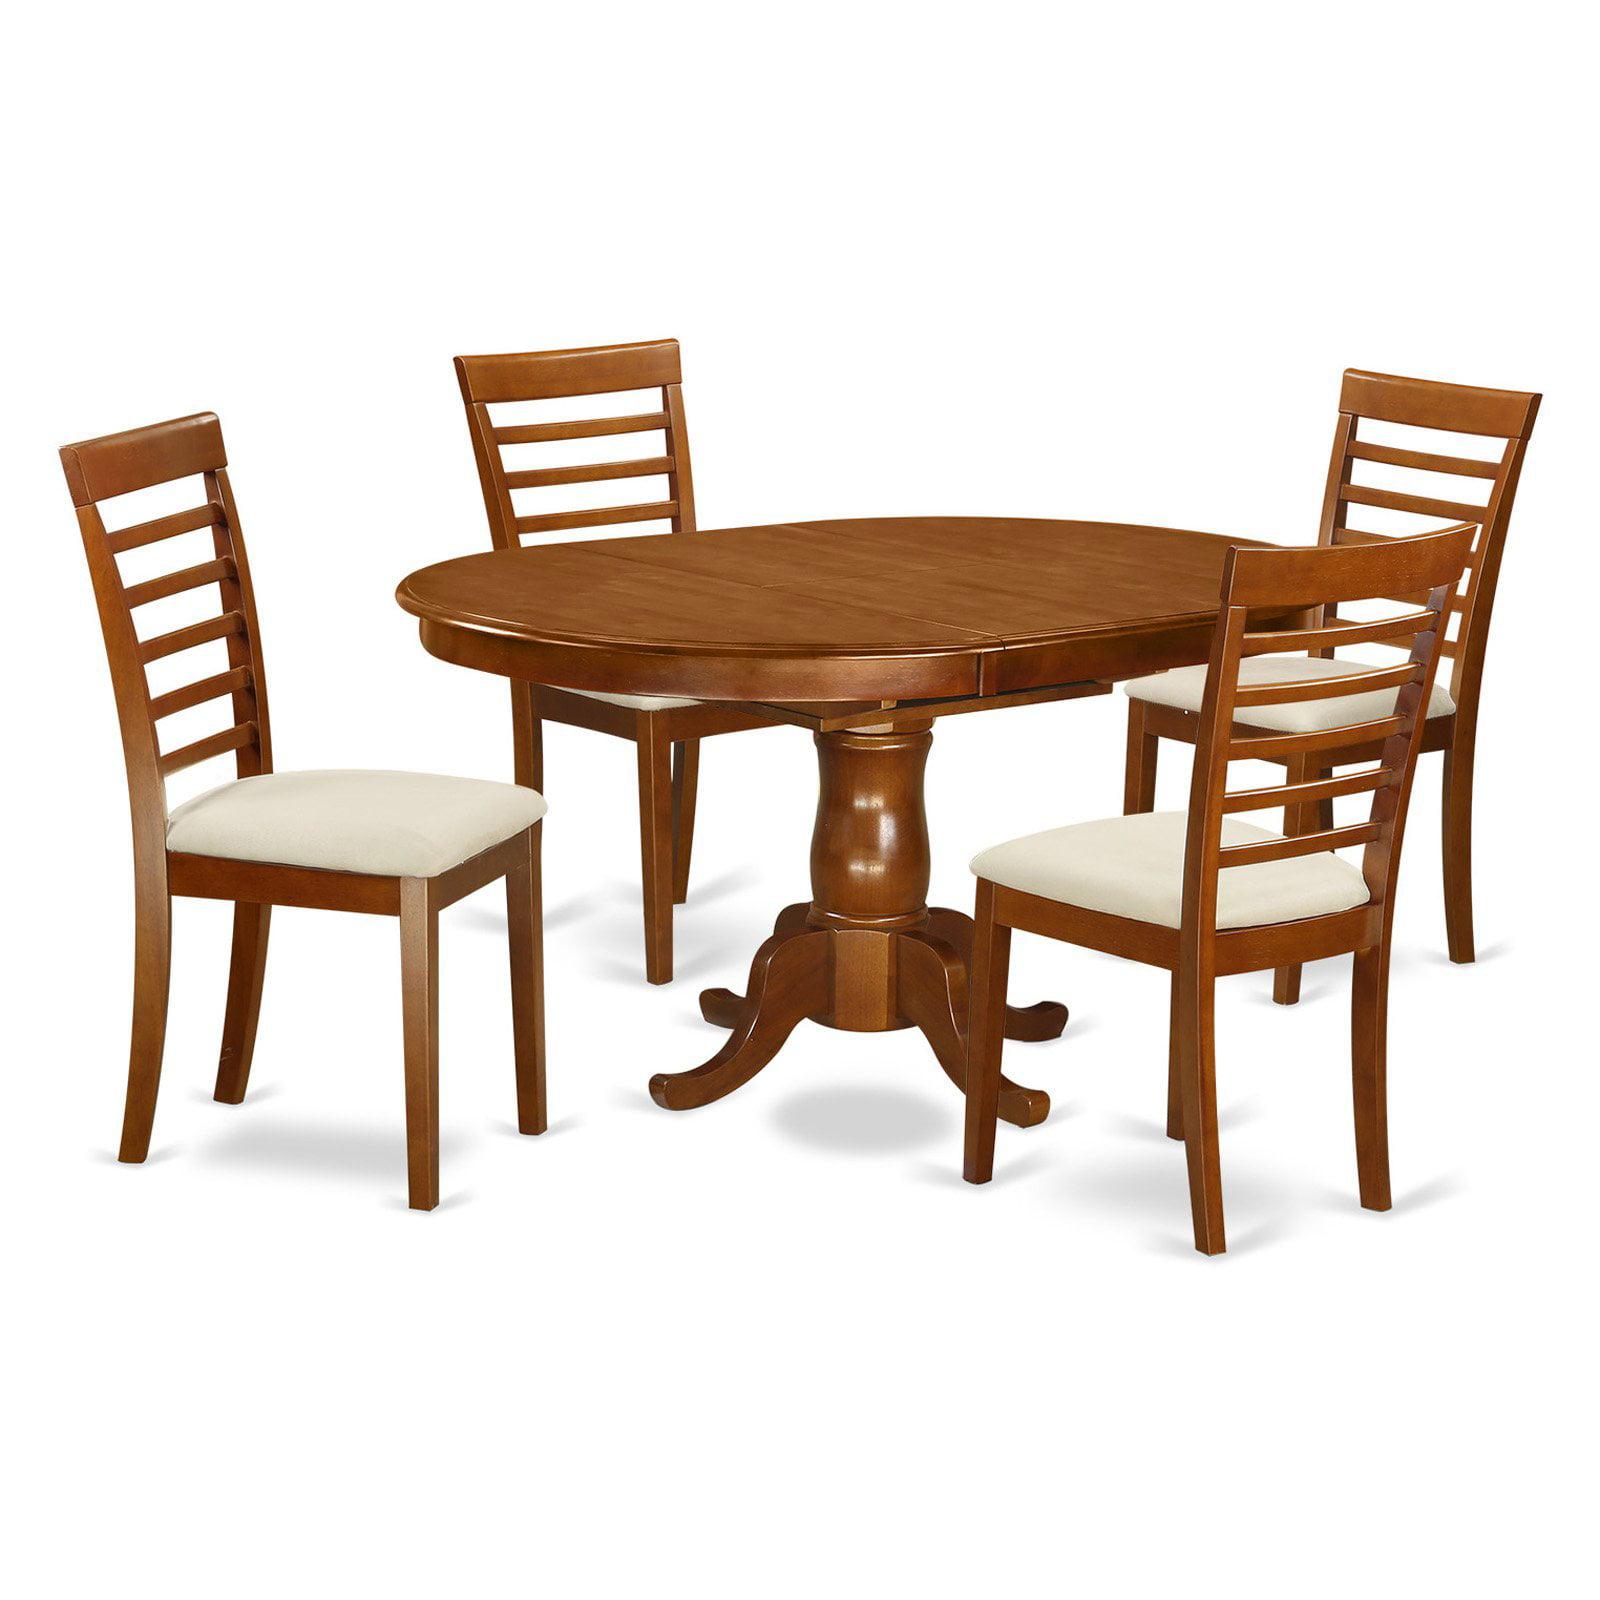 East West Furniture Portland 5 Piece Straight Ladderback Dining Table Set